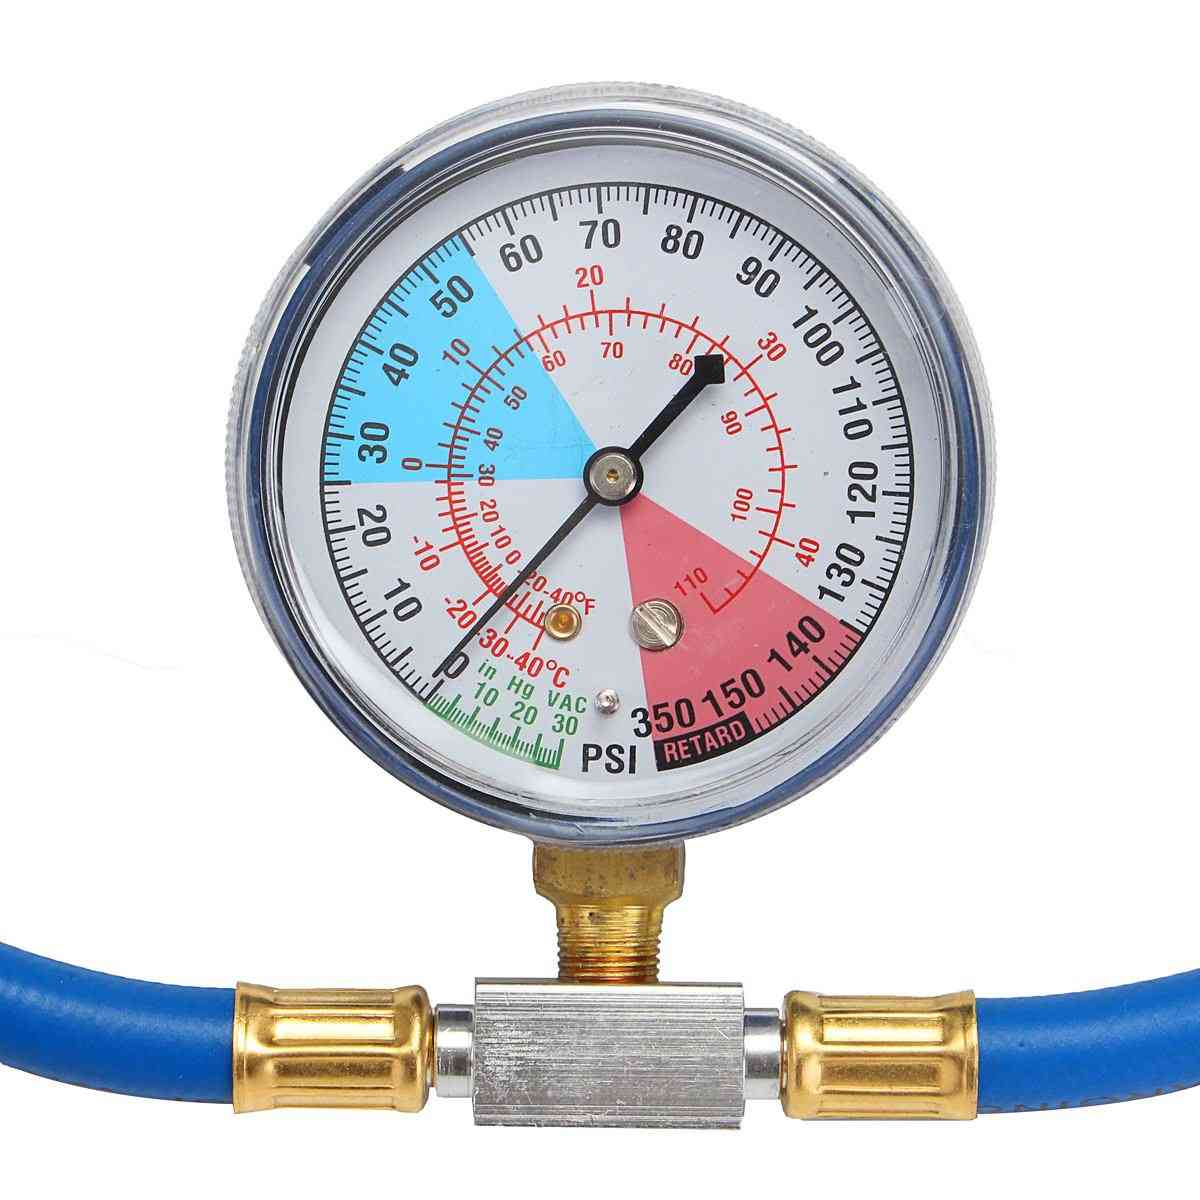 250psi Recharge Measuring Hose Gauge, Valve Refrigerant Pipe - Car Auto Air Conditioning